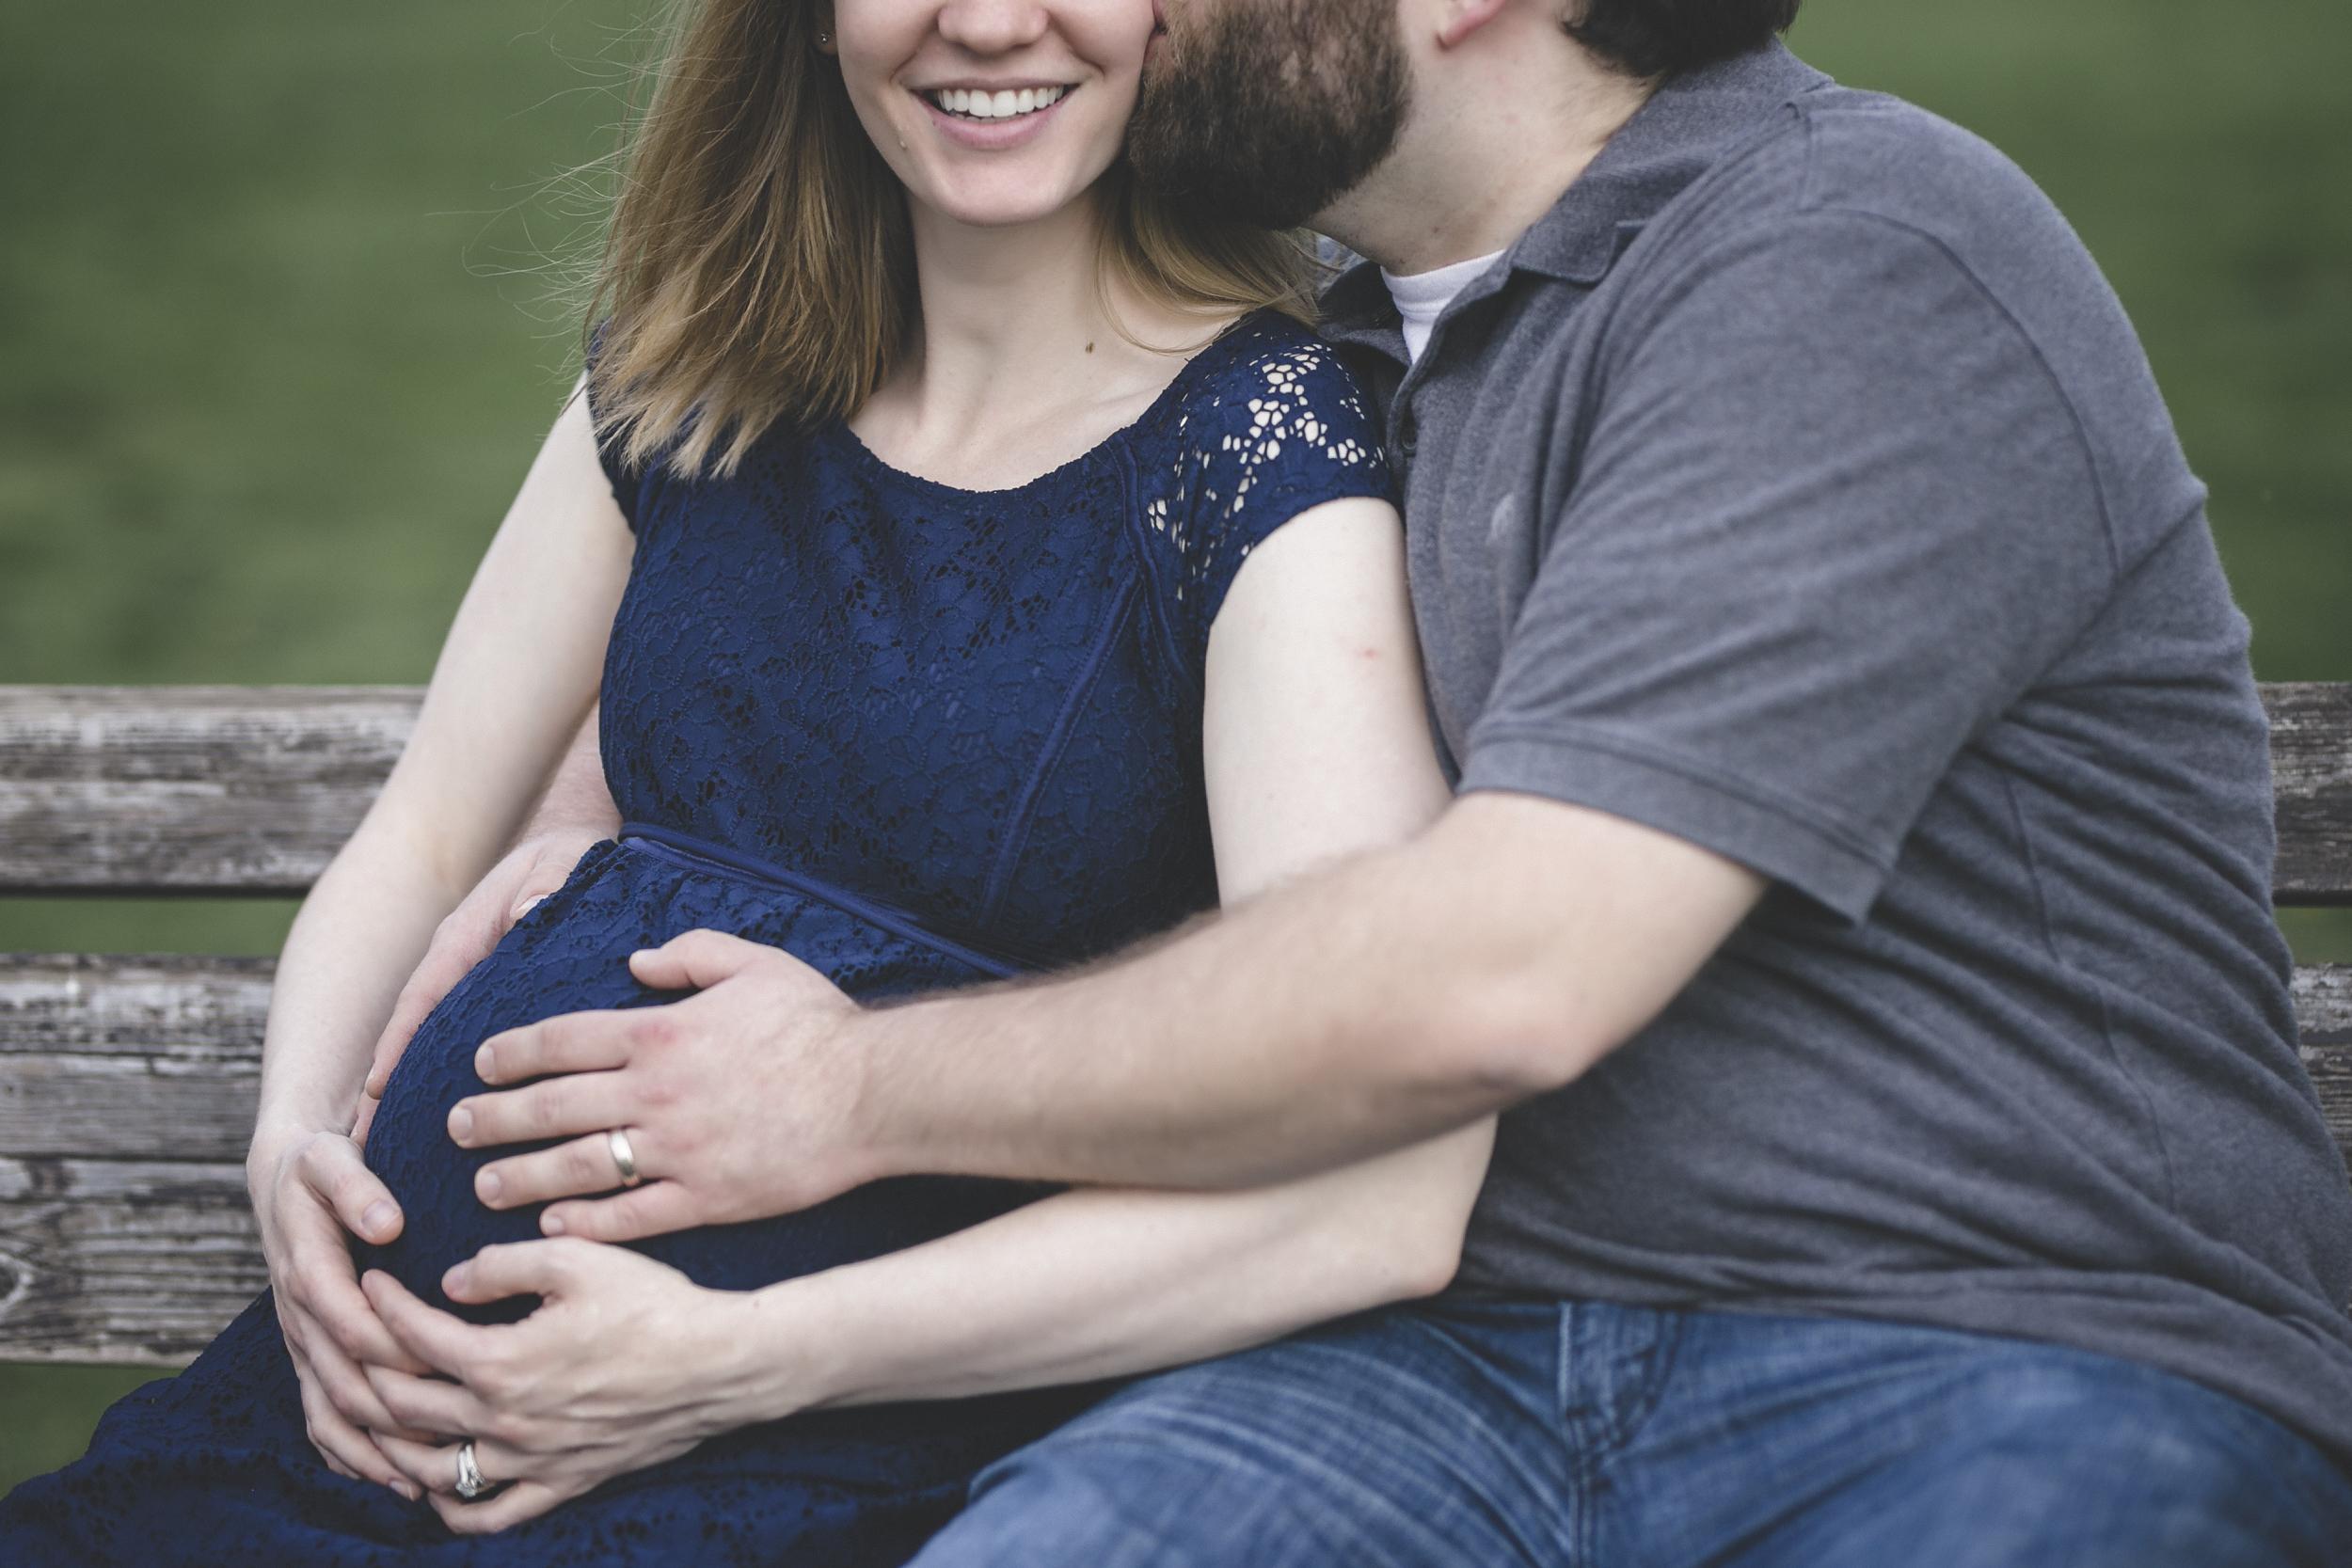 minneapolis maternity photographer-1.jpg